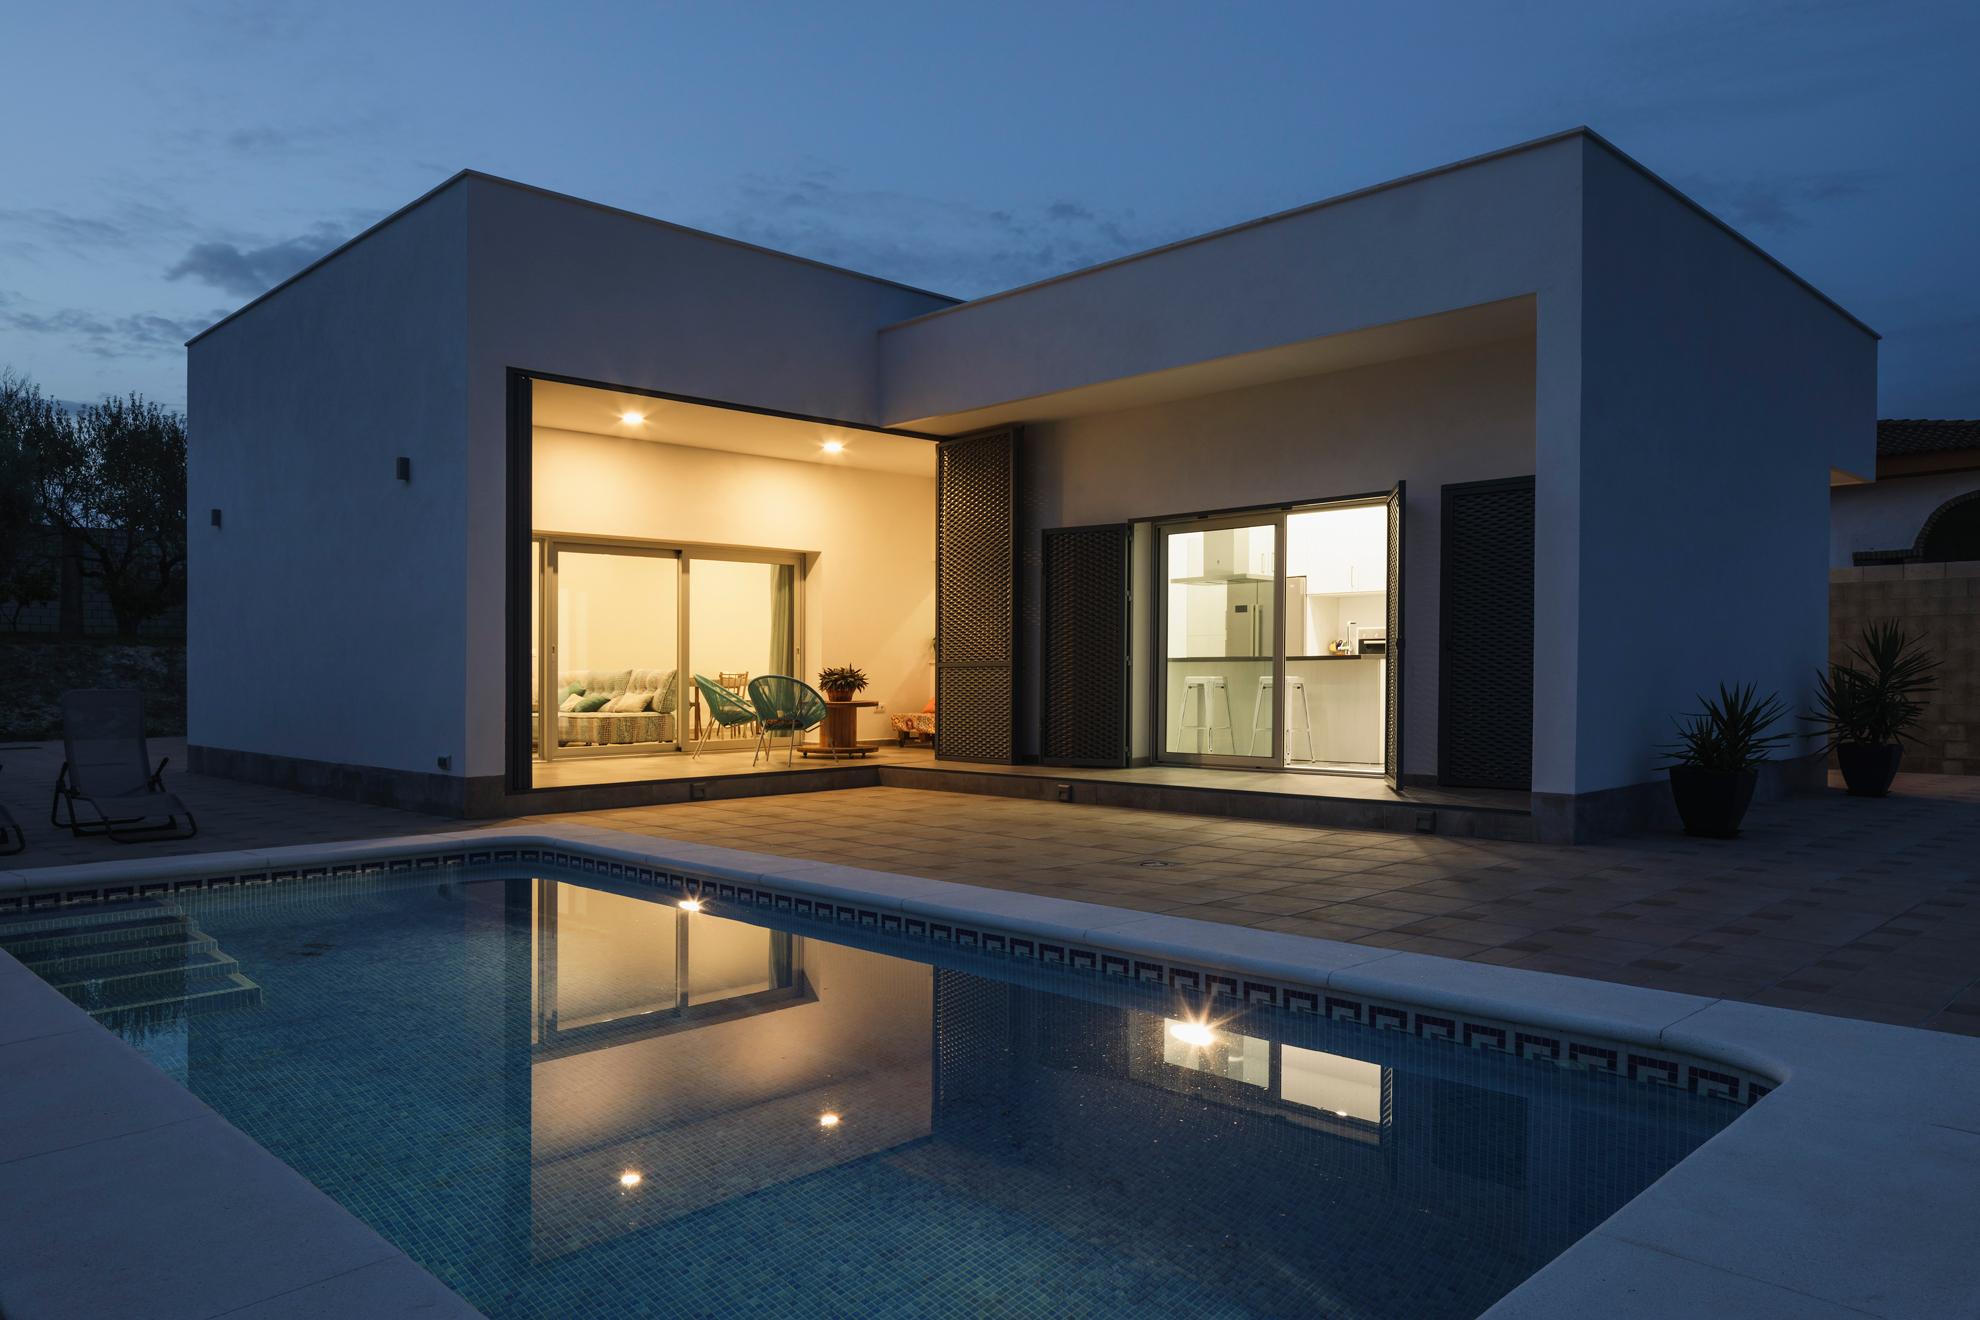 Casa miranda architect magazine faq arquitectura - Fotos de casas con piscina ...